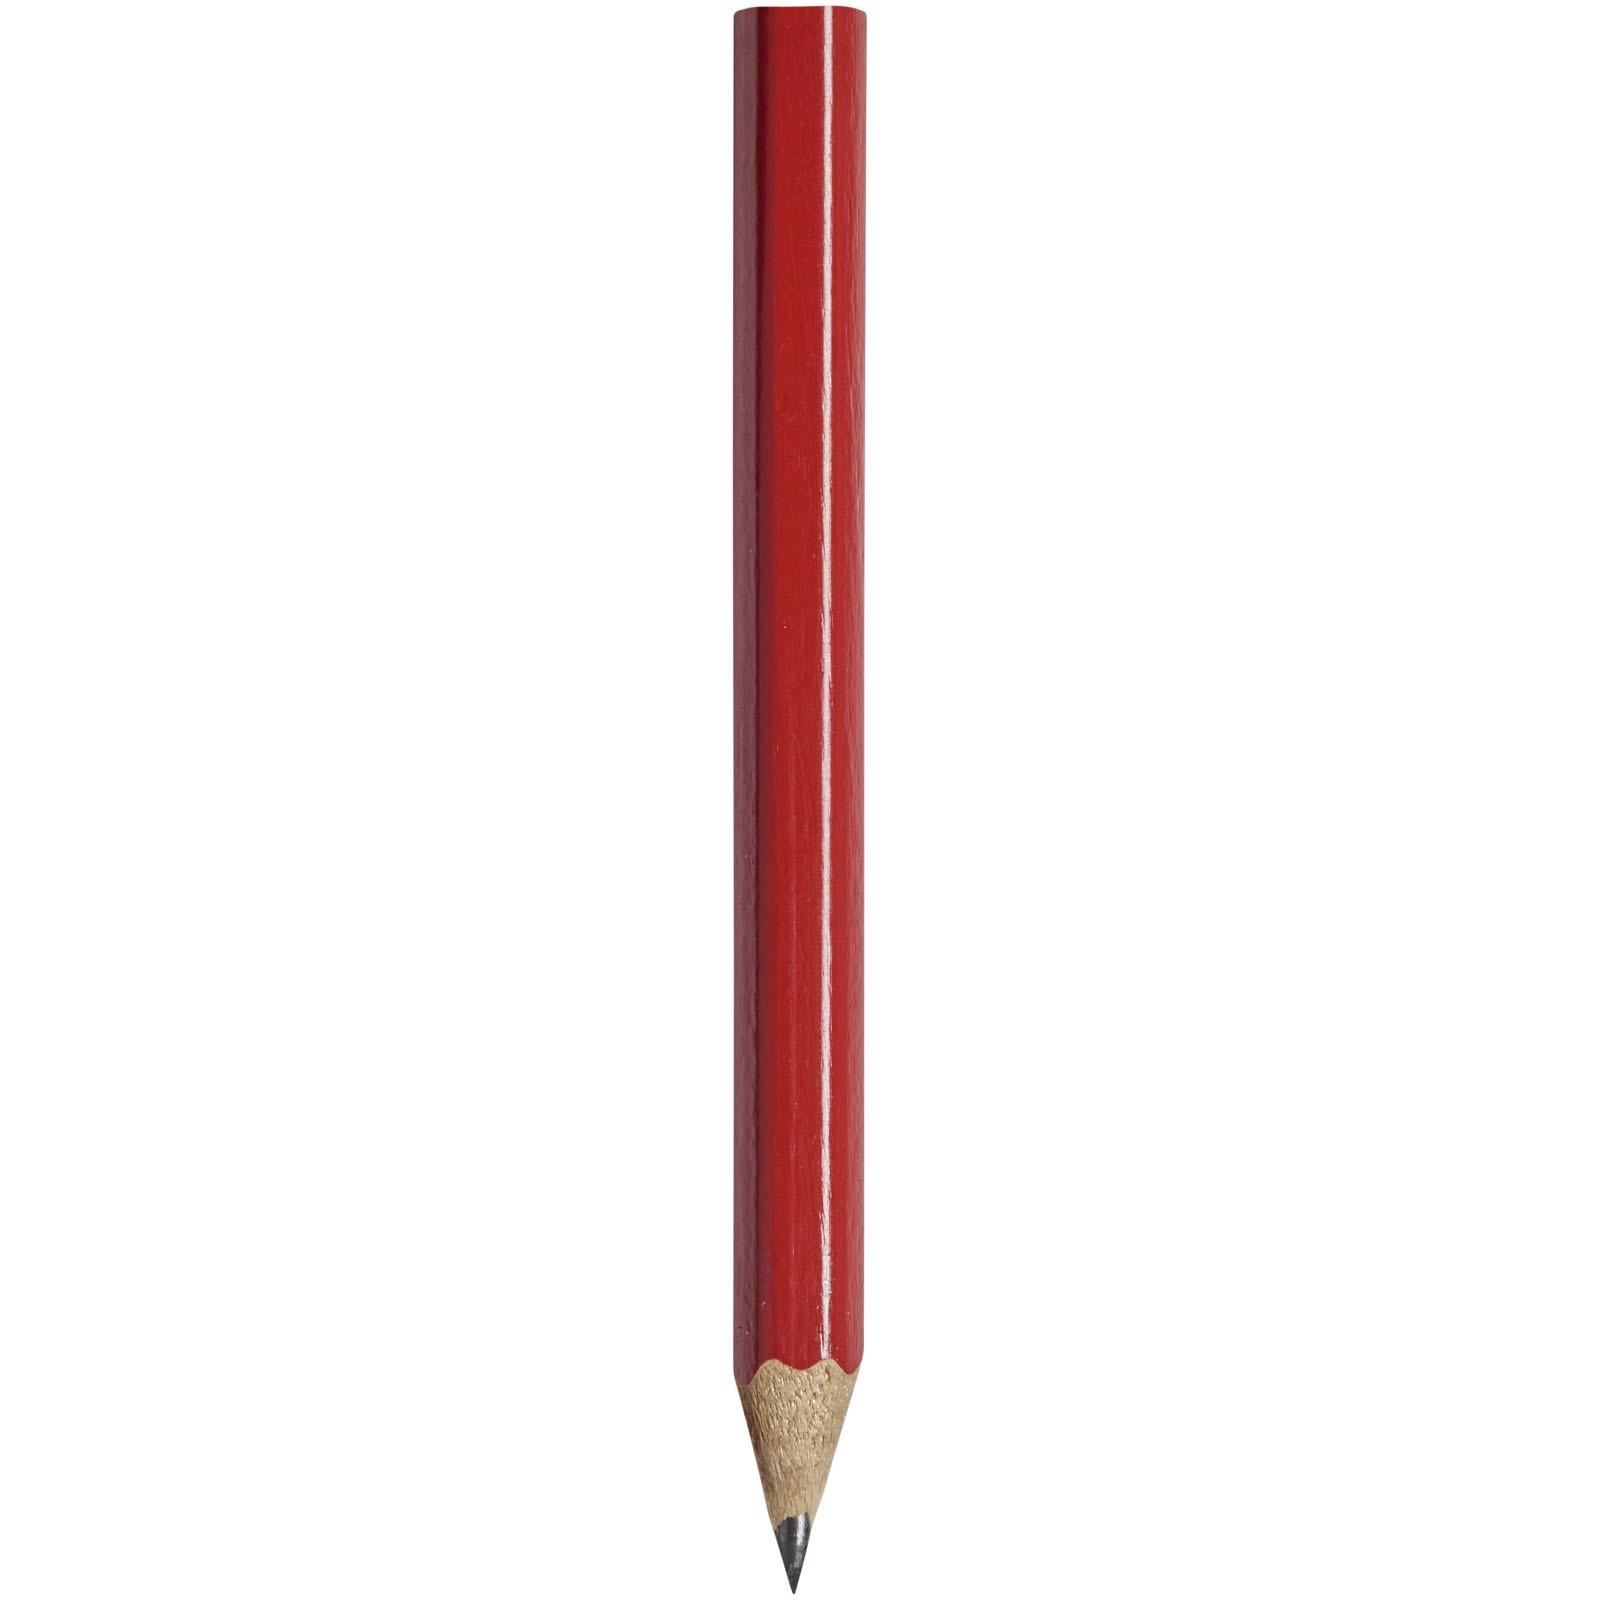 Cosimo Mini Bleistift mit farbigem Schaft - Rot